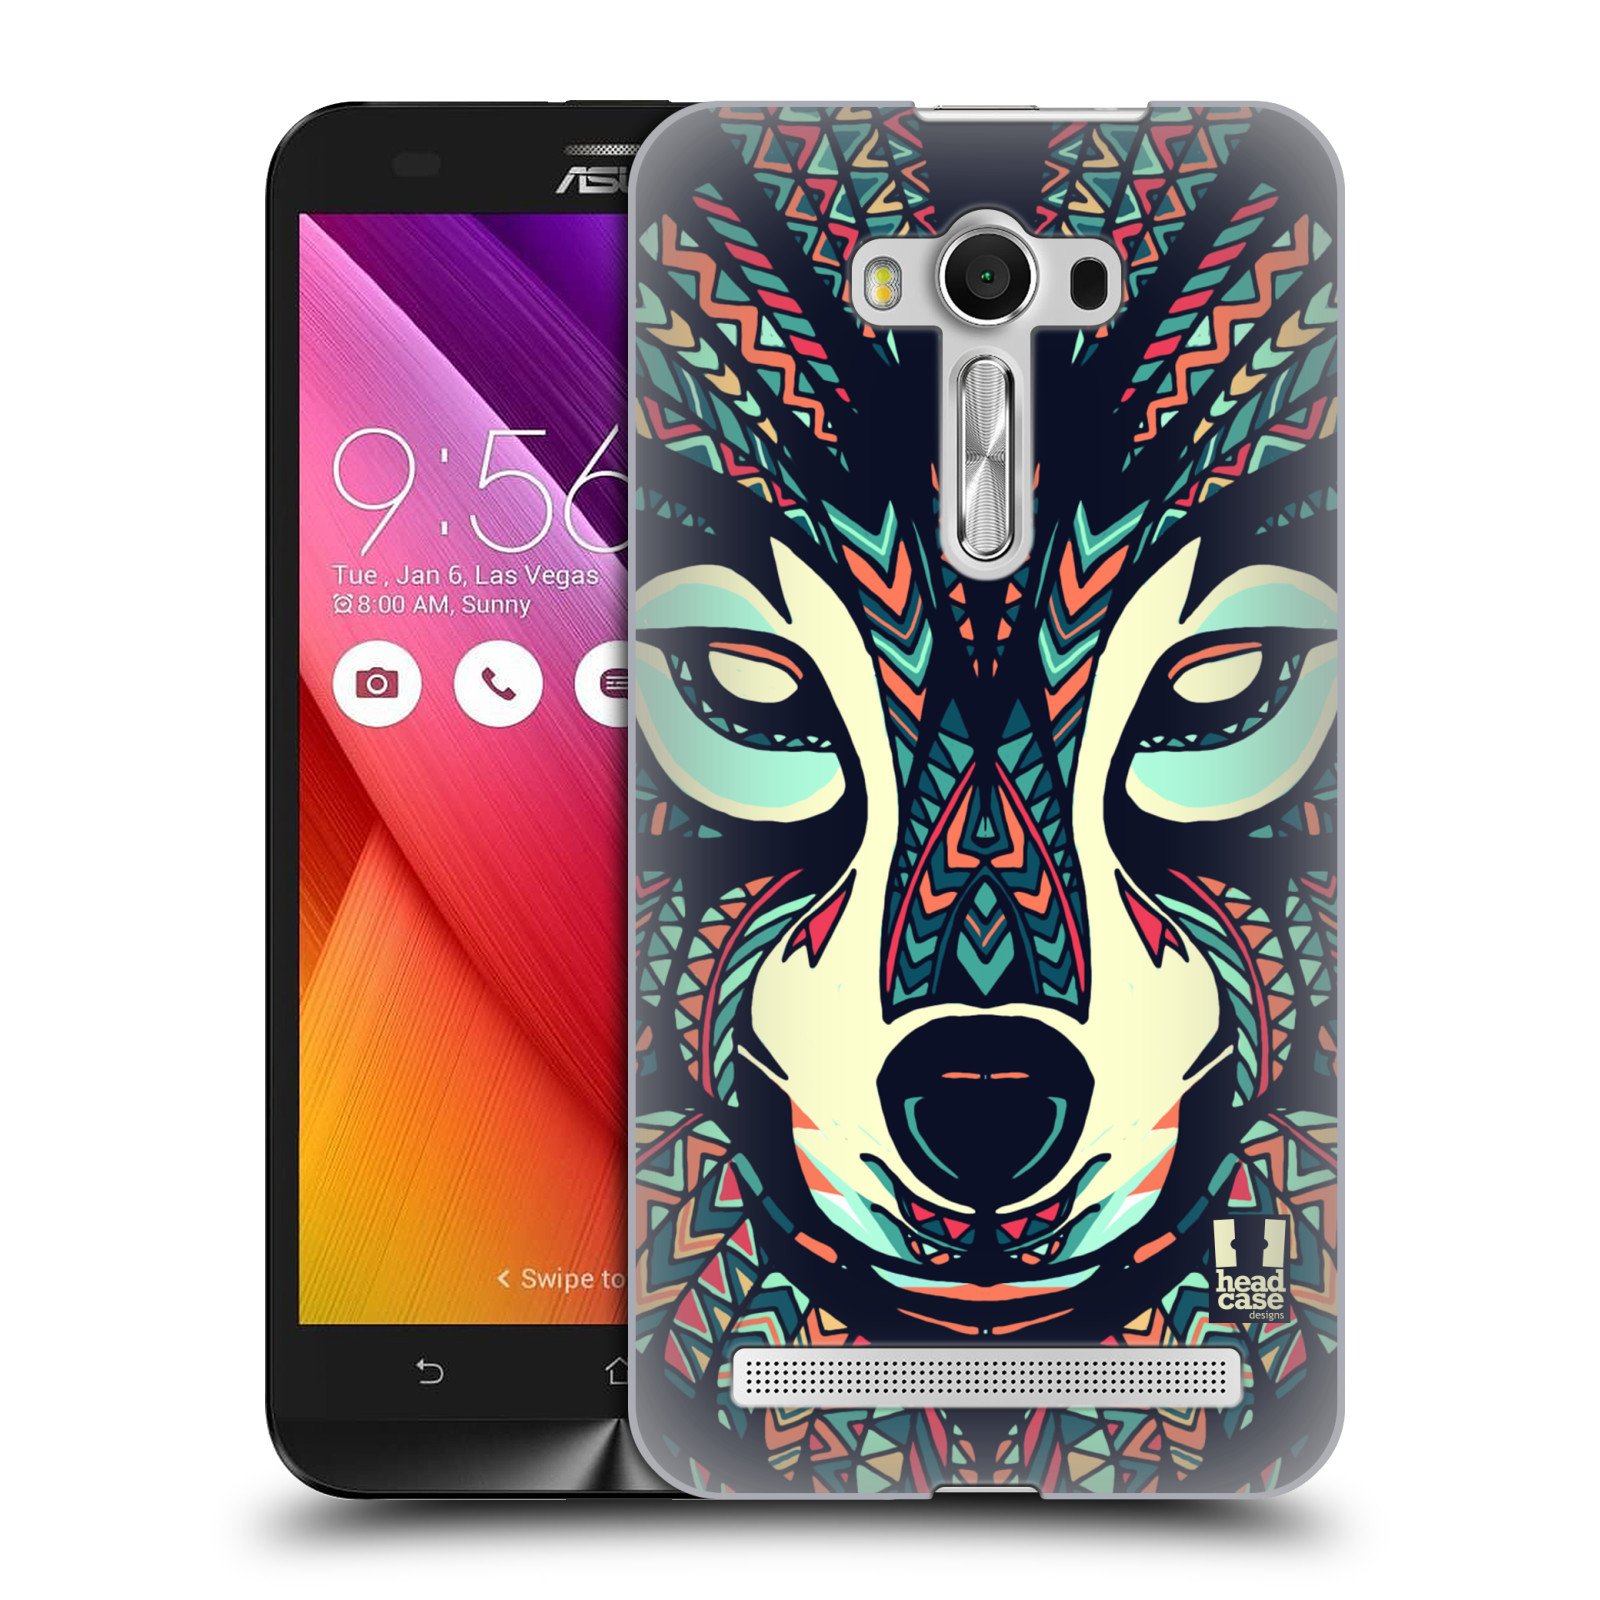 HEAD CASE plastový obal na mobil Asus Zenfone 2 LASER (5,5 displej ZE550KL) vzor Aztécký motiv zvíře 3 vlk